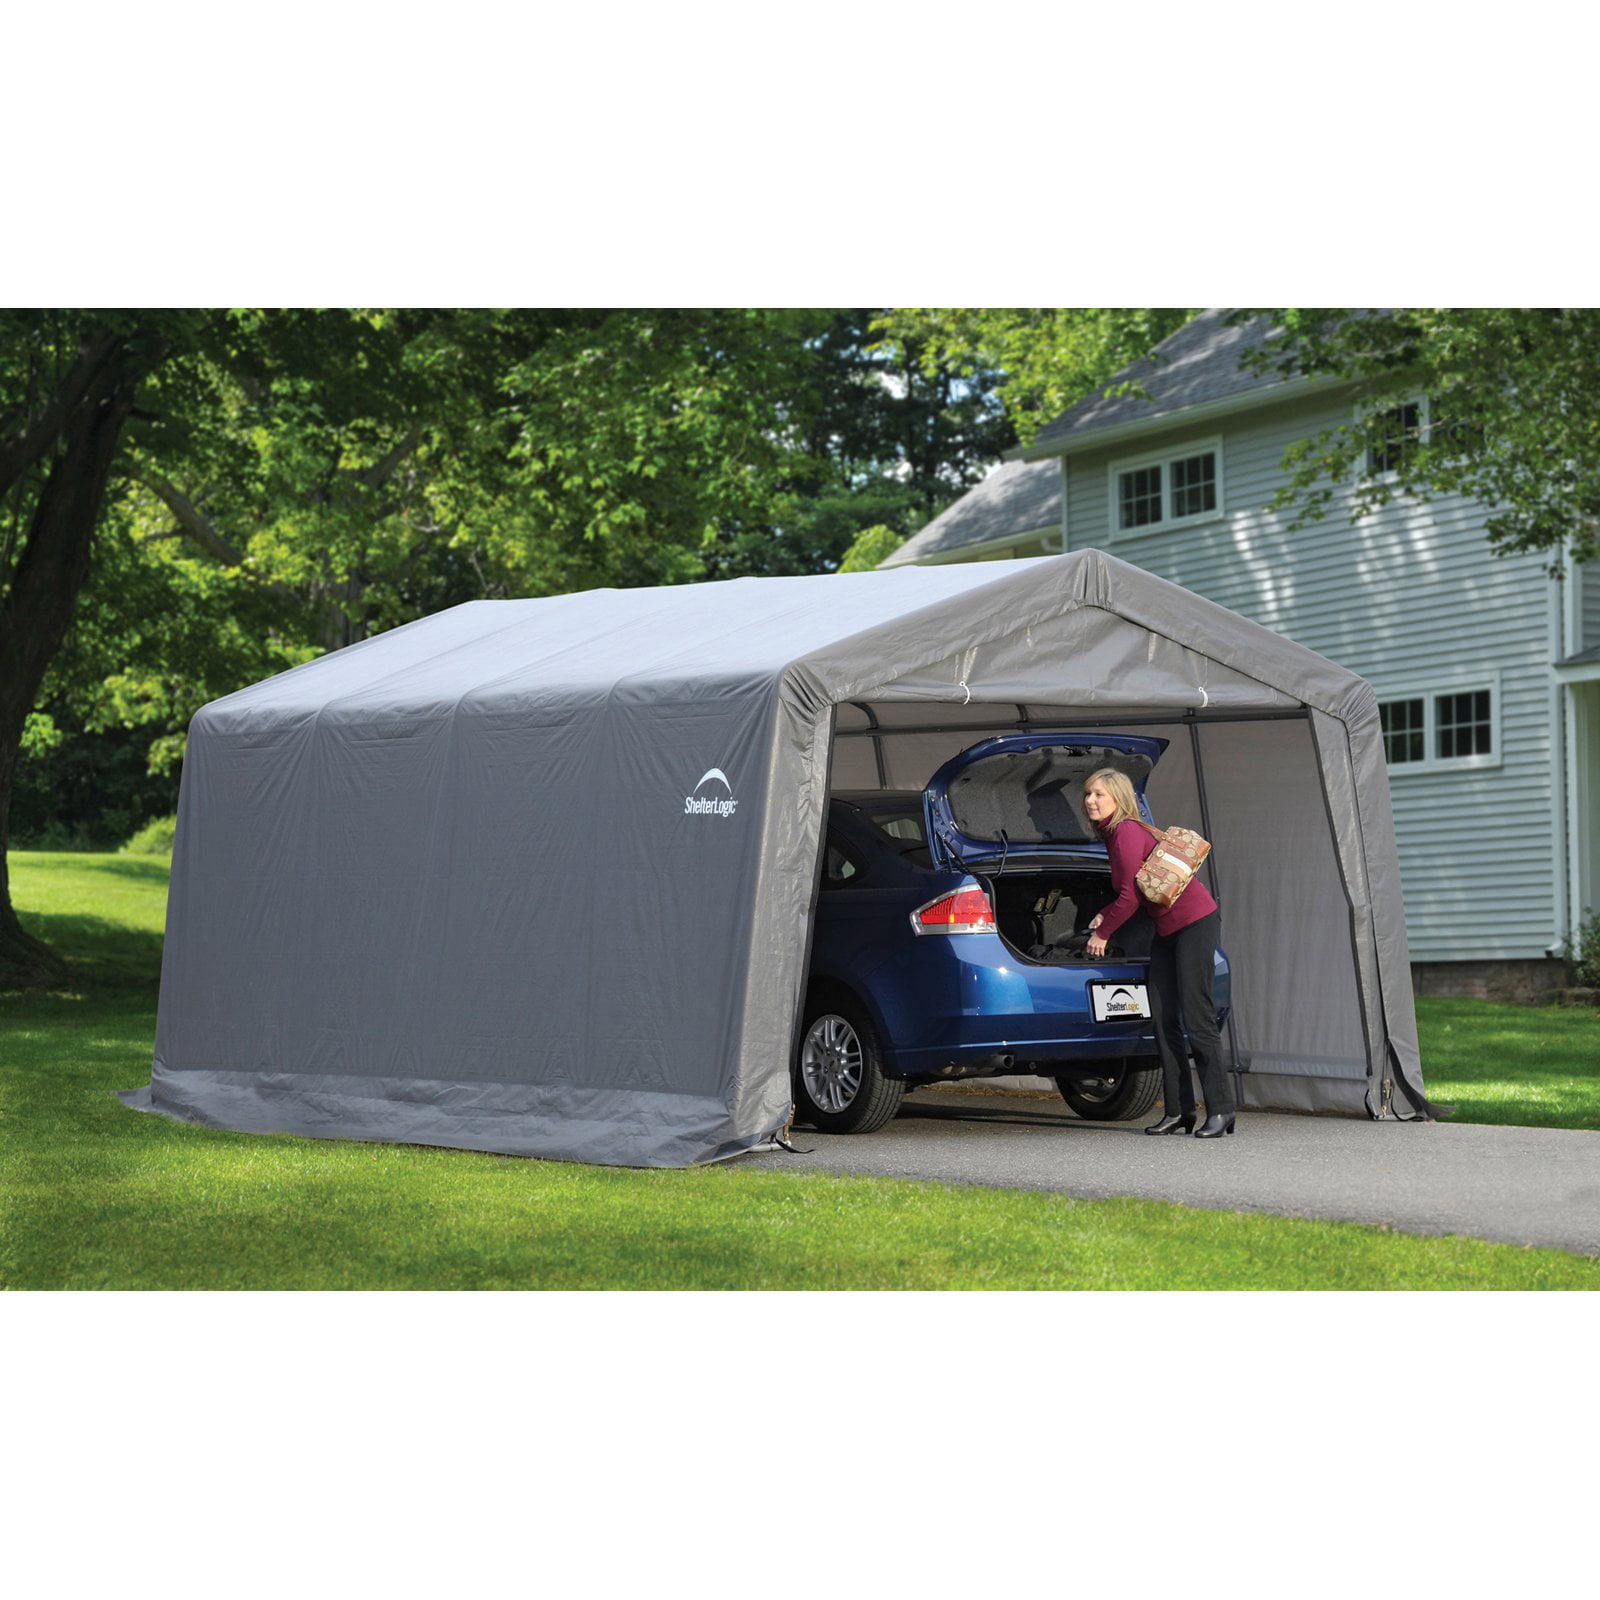 lifestyle you sheds choose vs carport canada shelterlogic should garage compact gib what